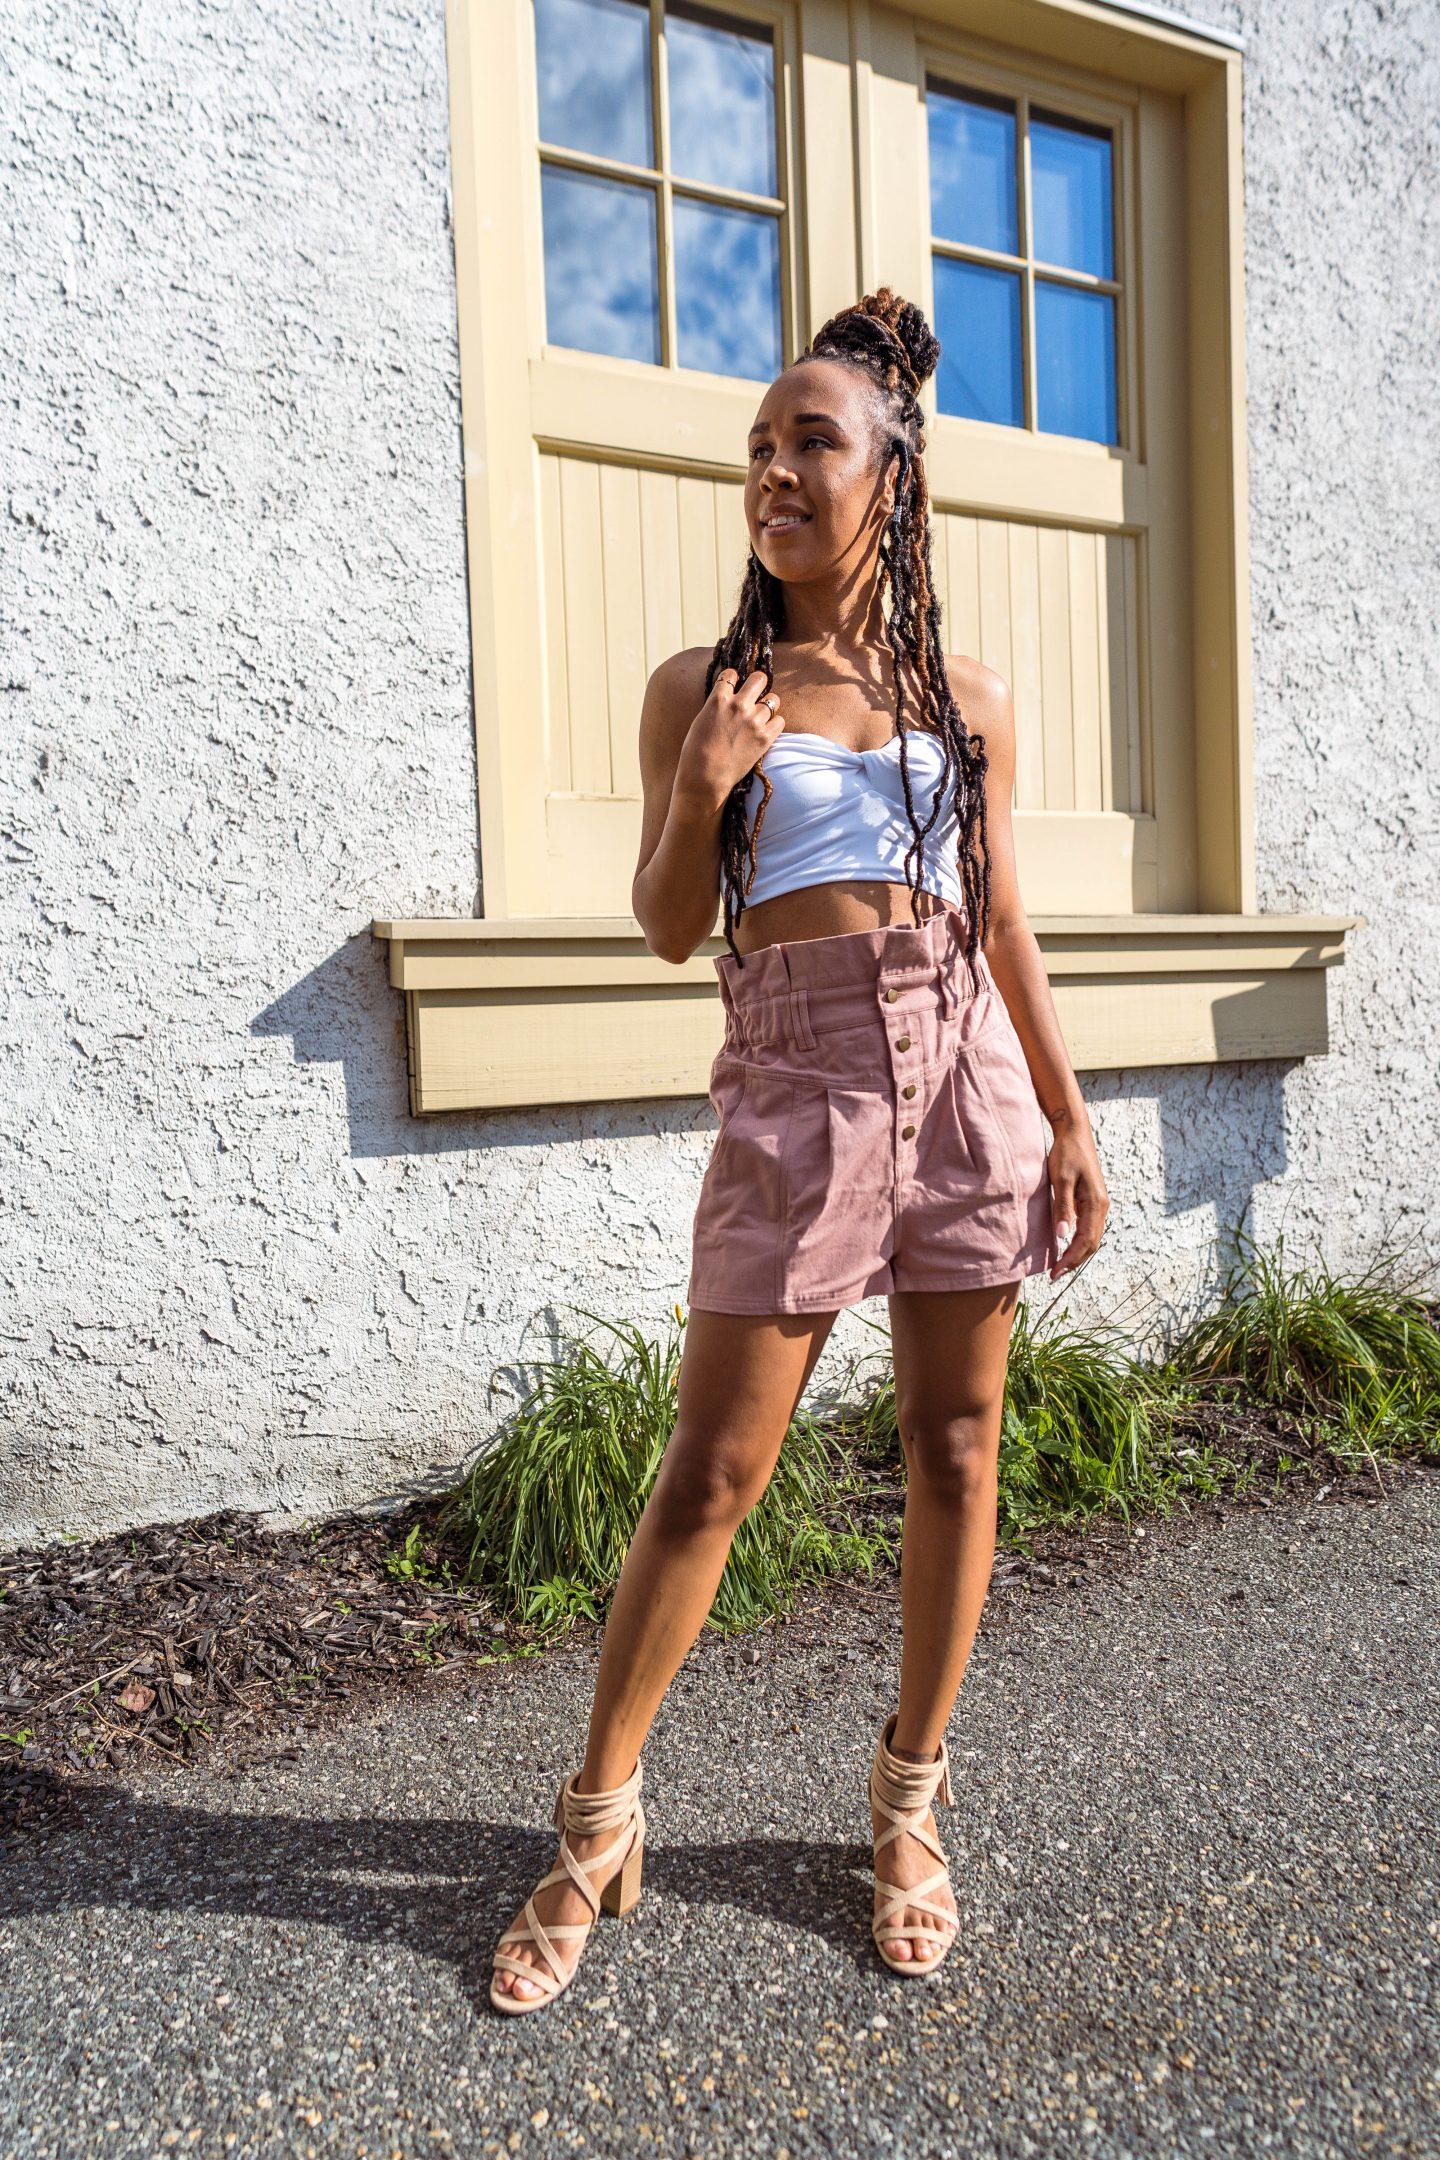 livinglesh how to dress for the summer heat